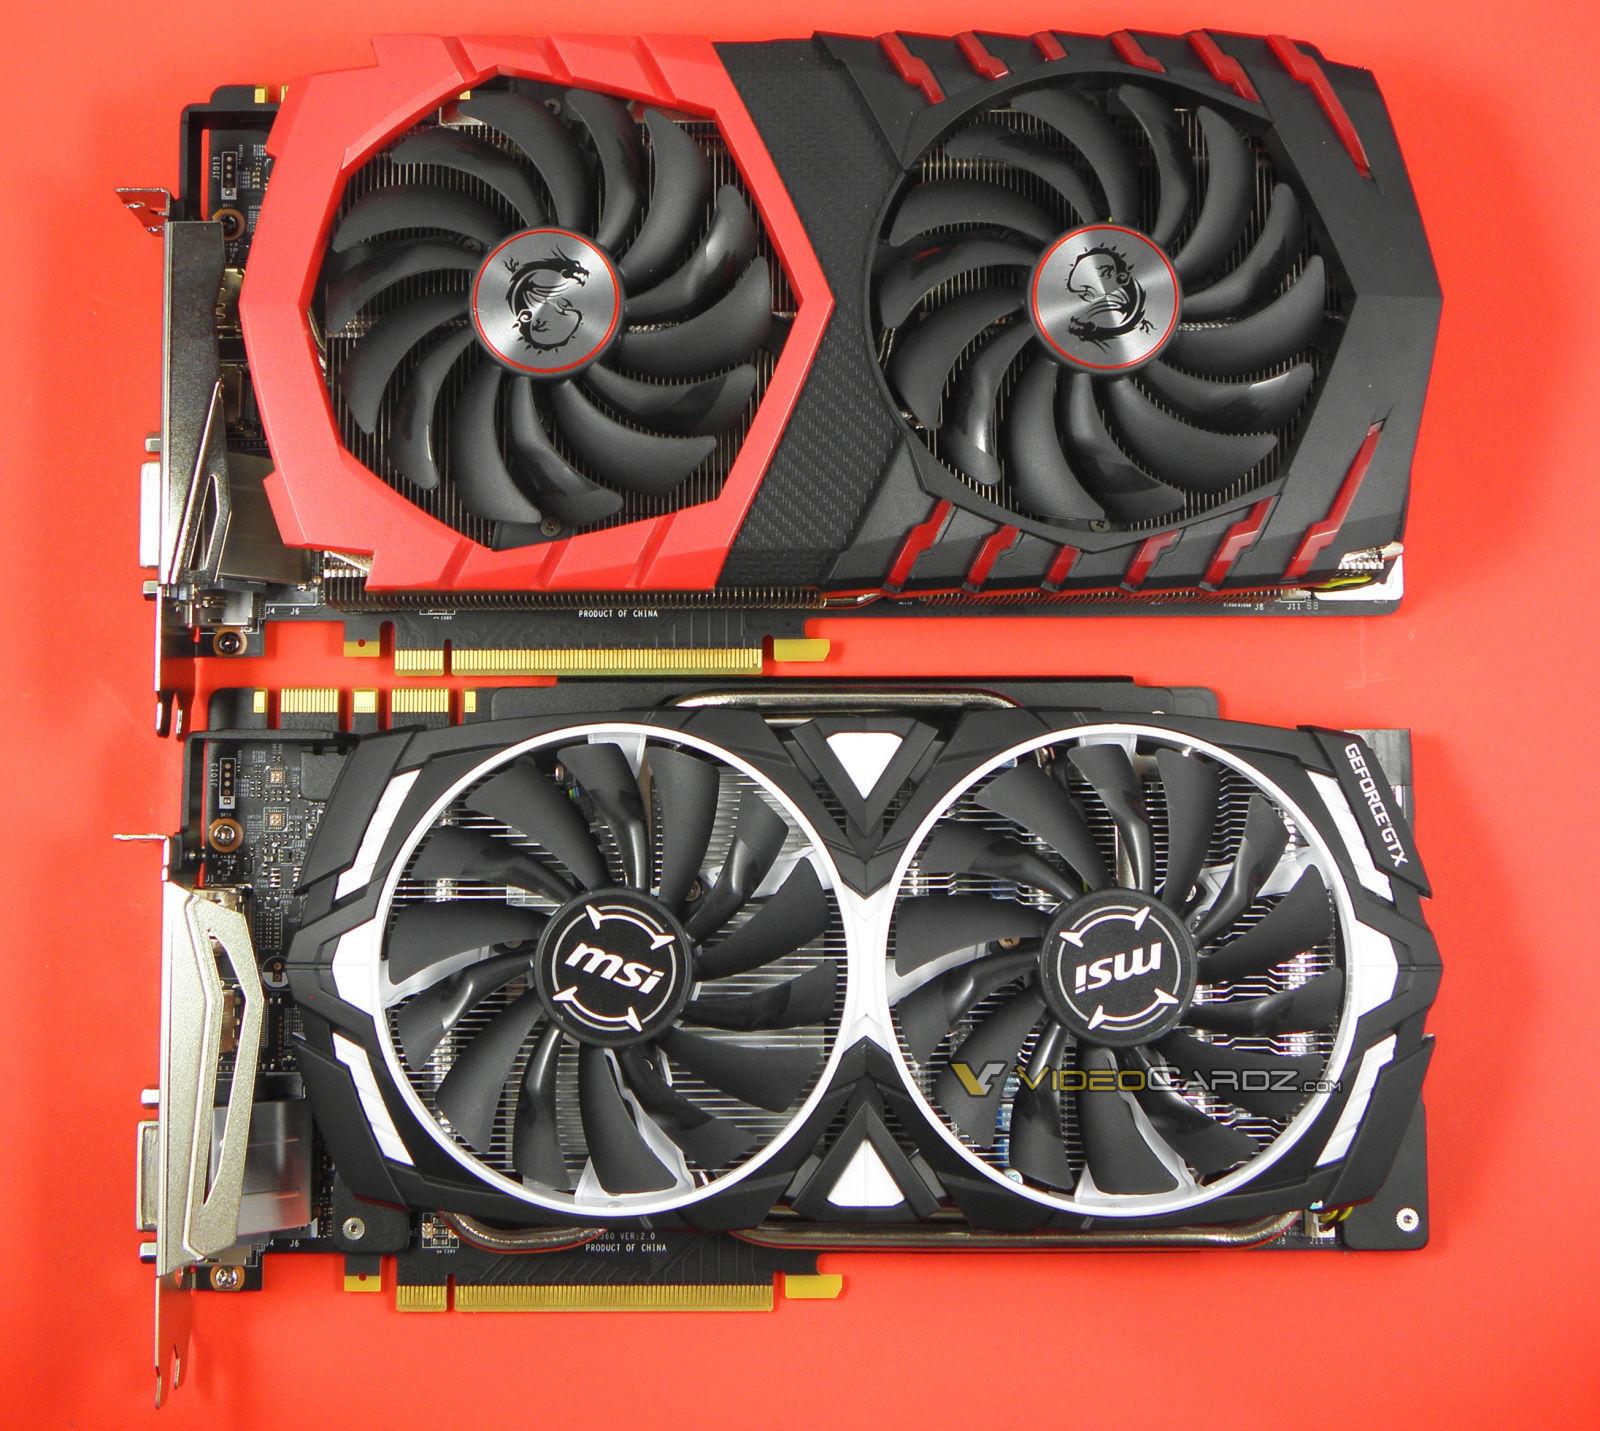 MSI GeForce GTX 1080 Ti ARMOR Review - A closer look @@ MSI GeForce